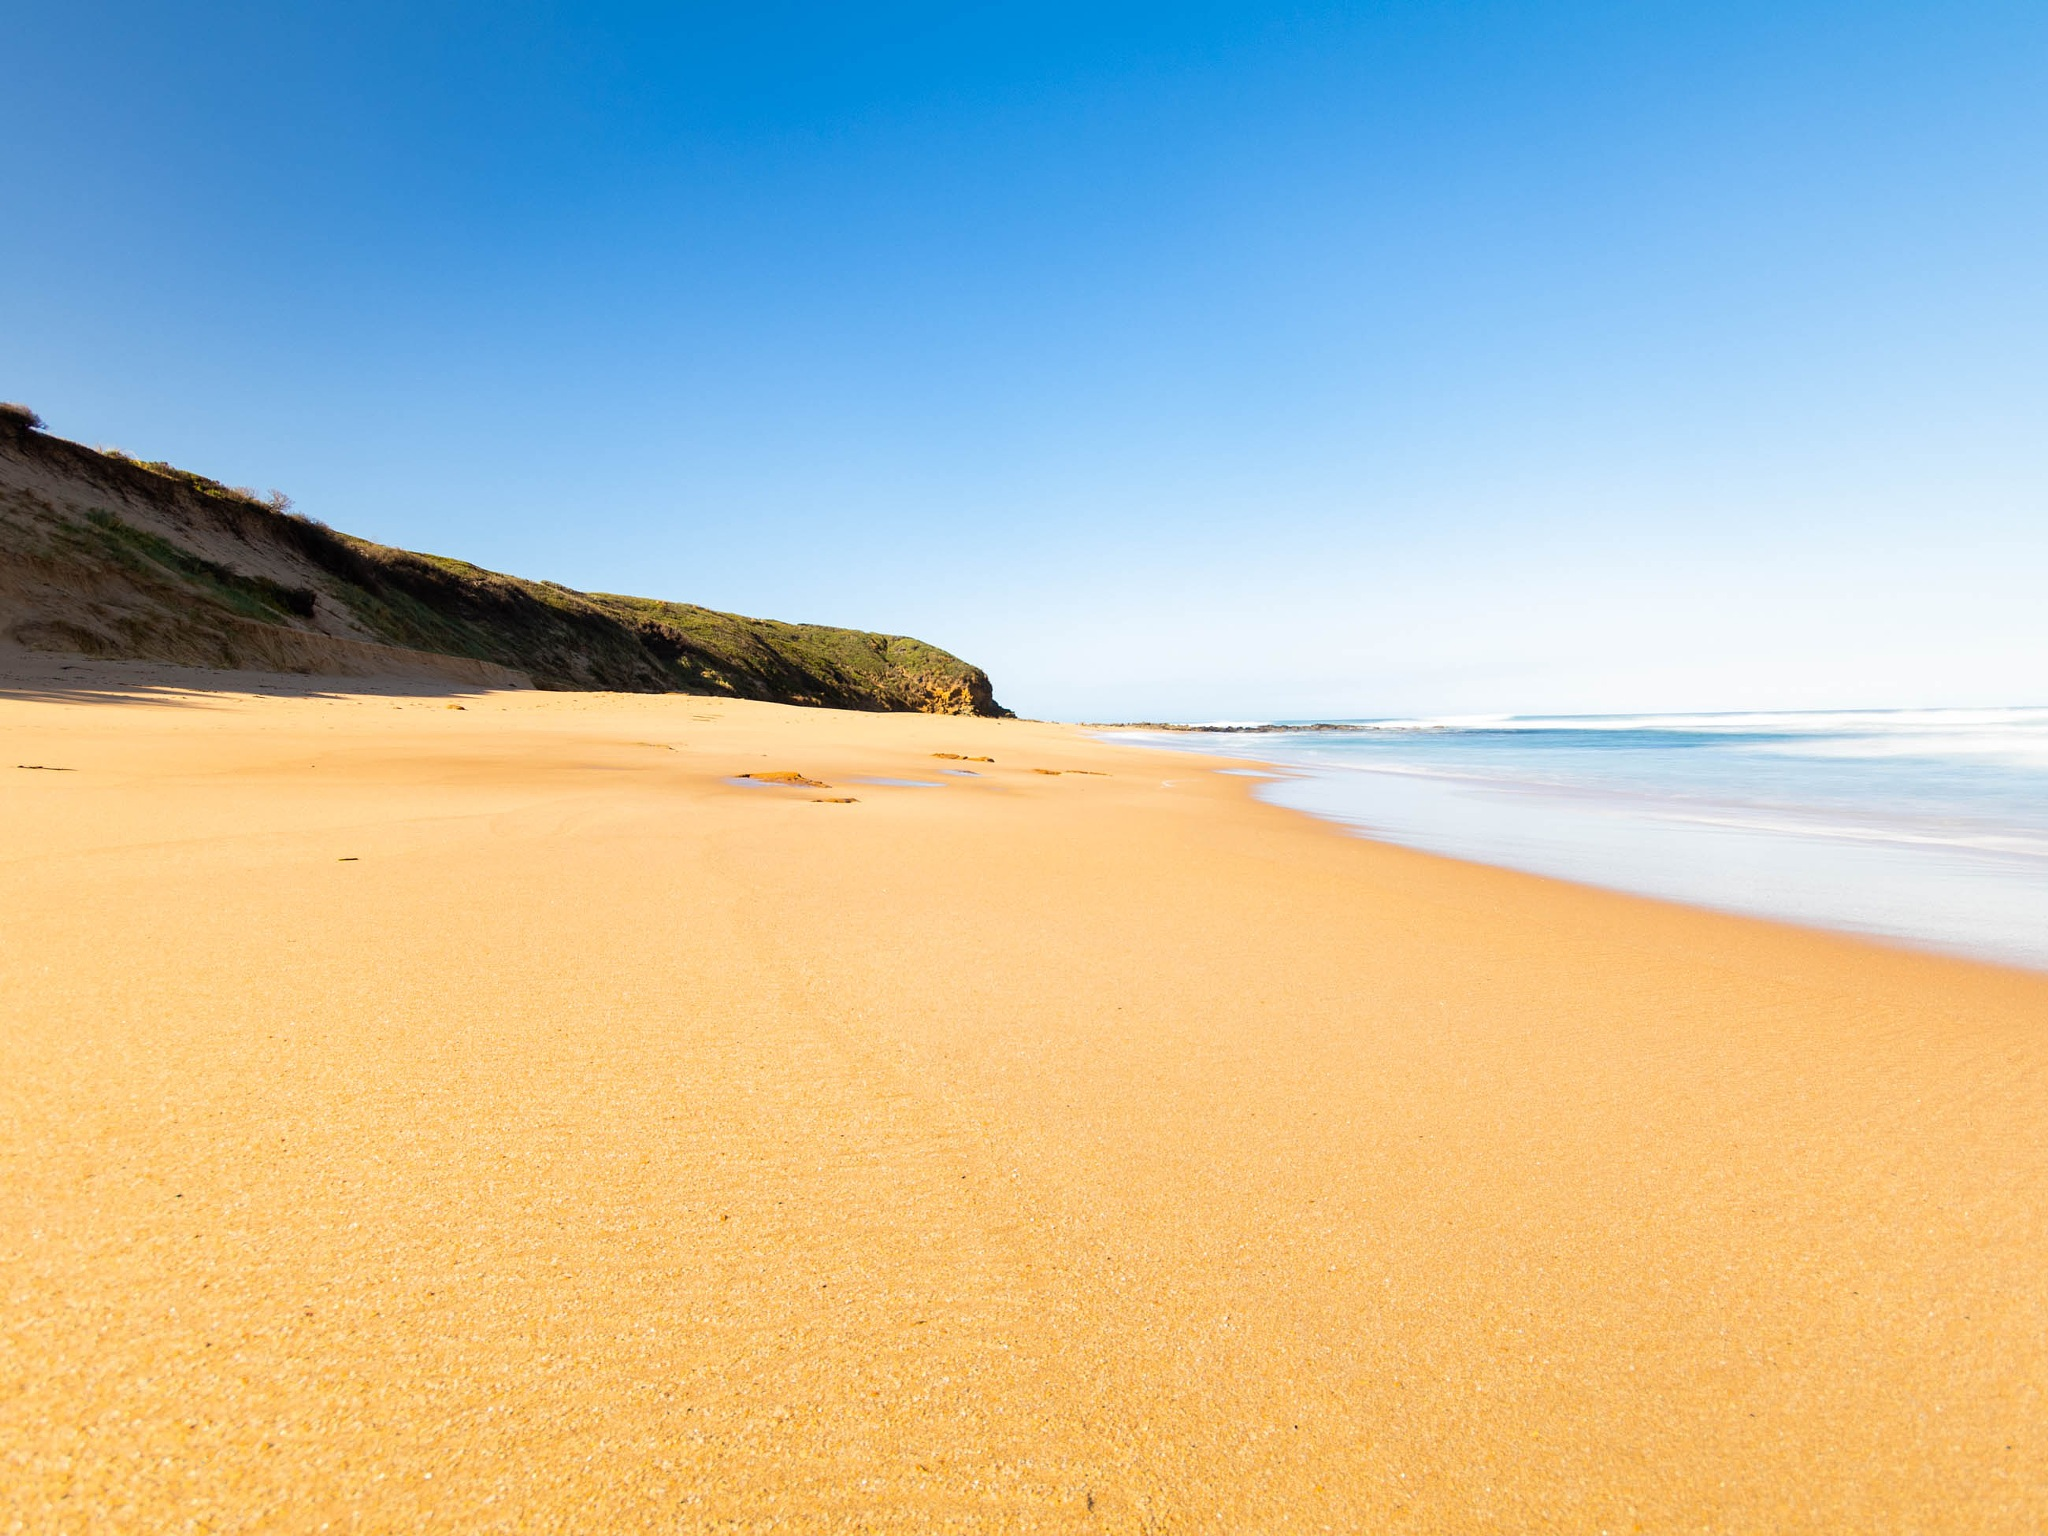 Kilcunda Beach by Thunder1203